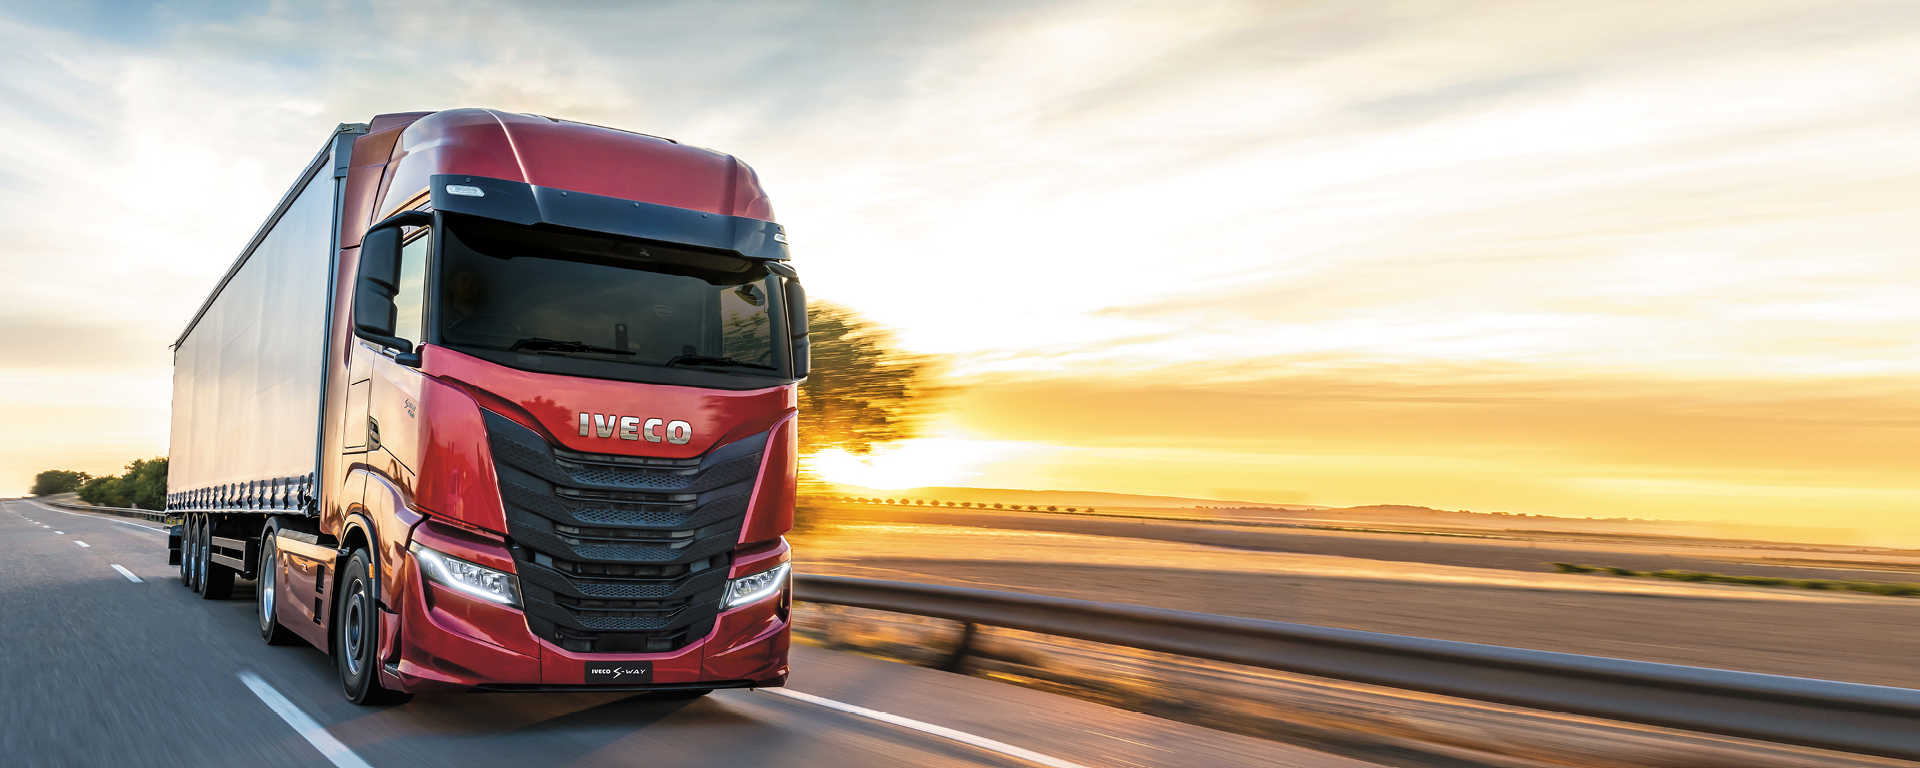 S-Way-dawn-red incentivi per gli autotrasportatori